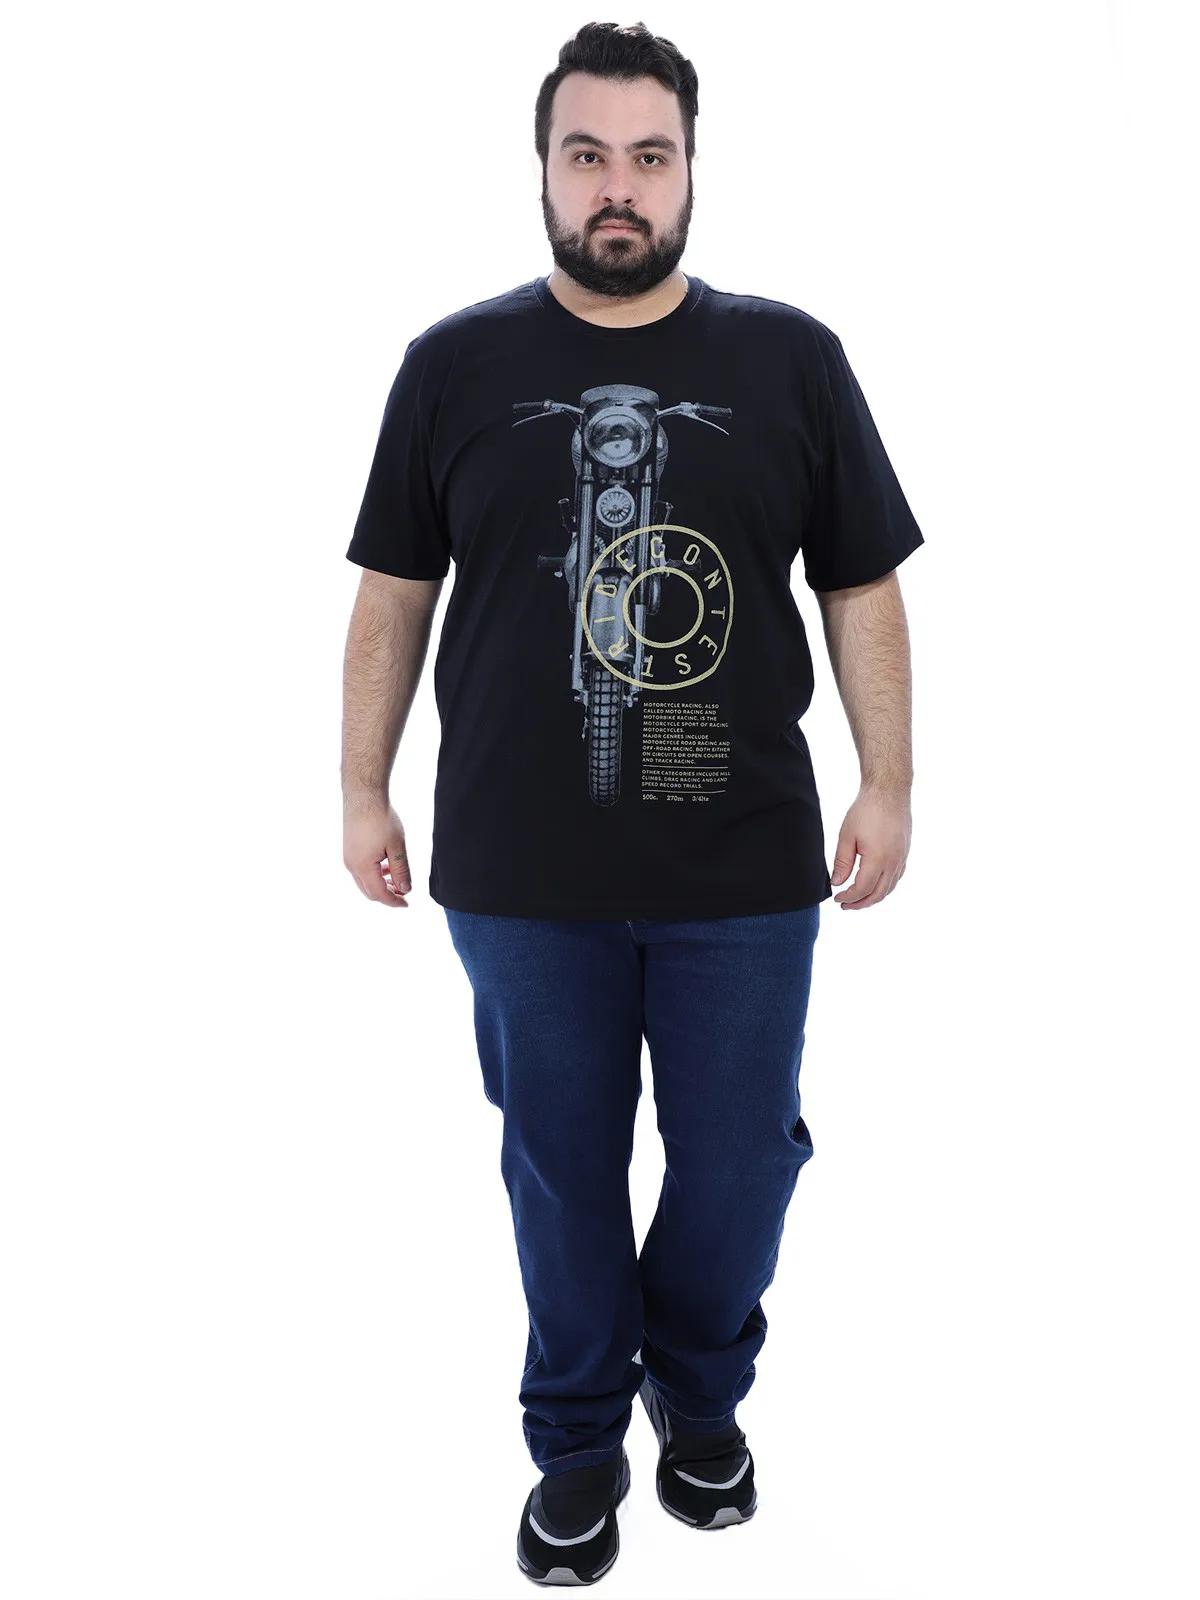 Camiseta Plus Size Masculino Gola Careca Estampa Moto Preta